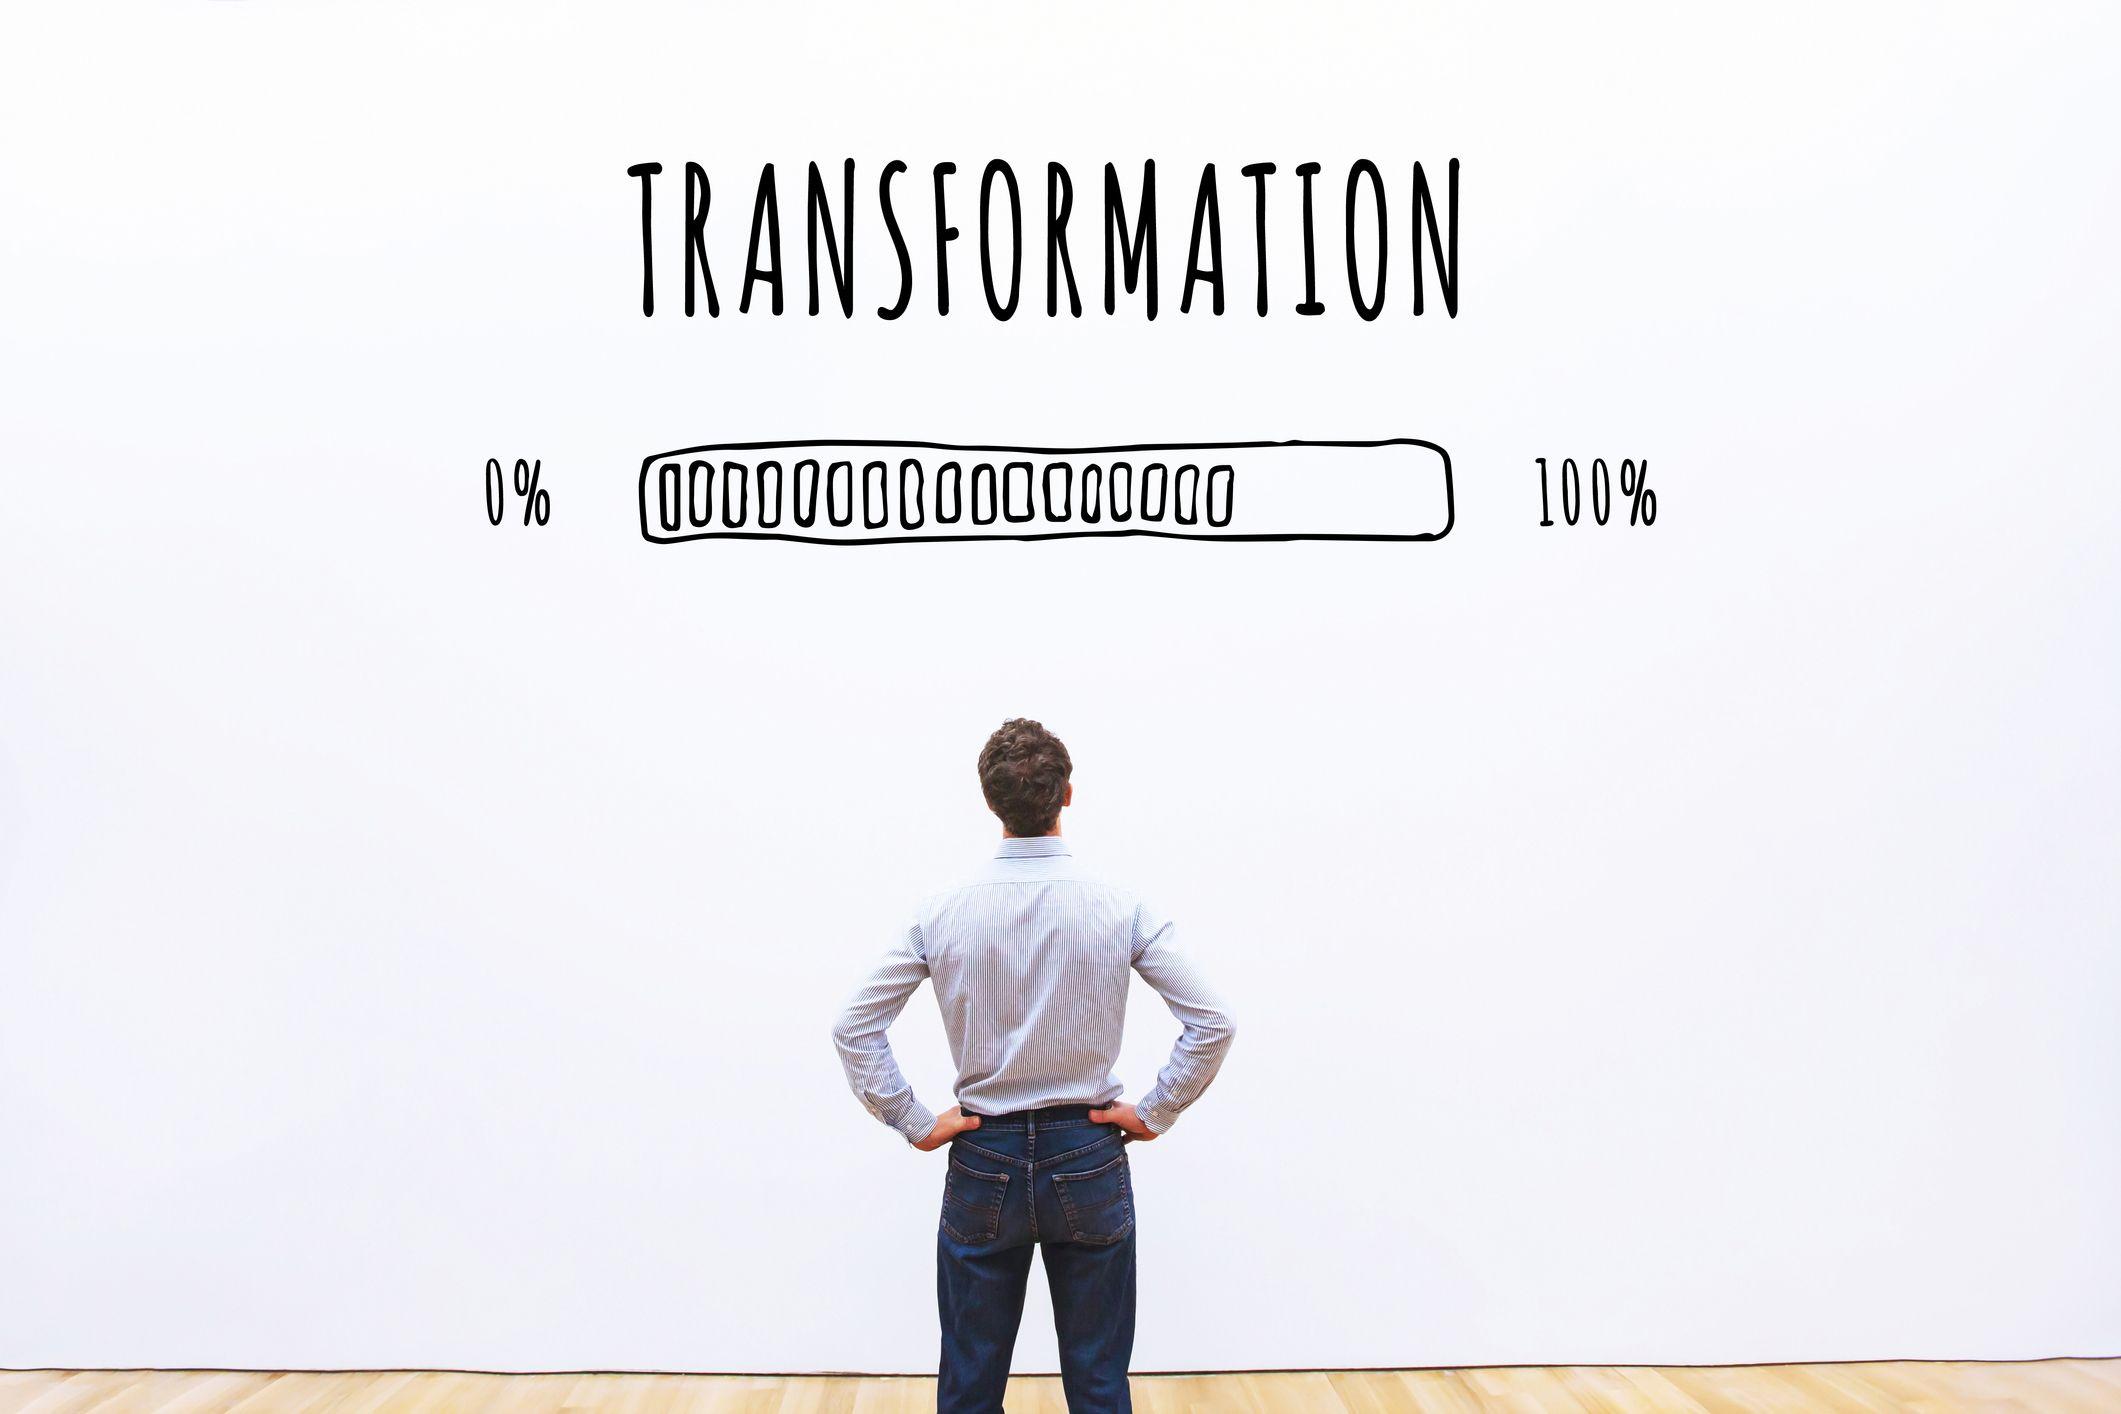 Loading transformation